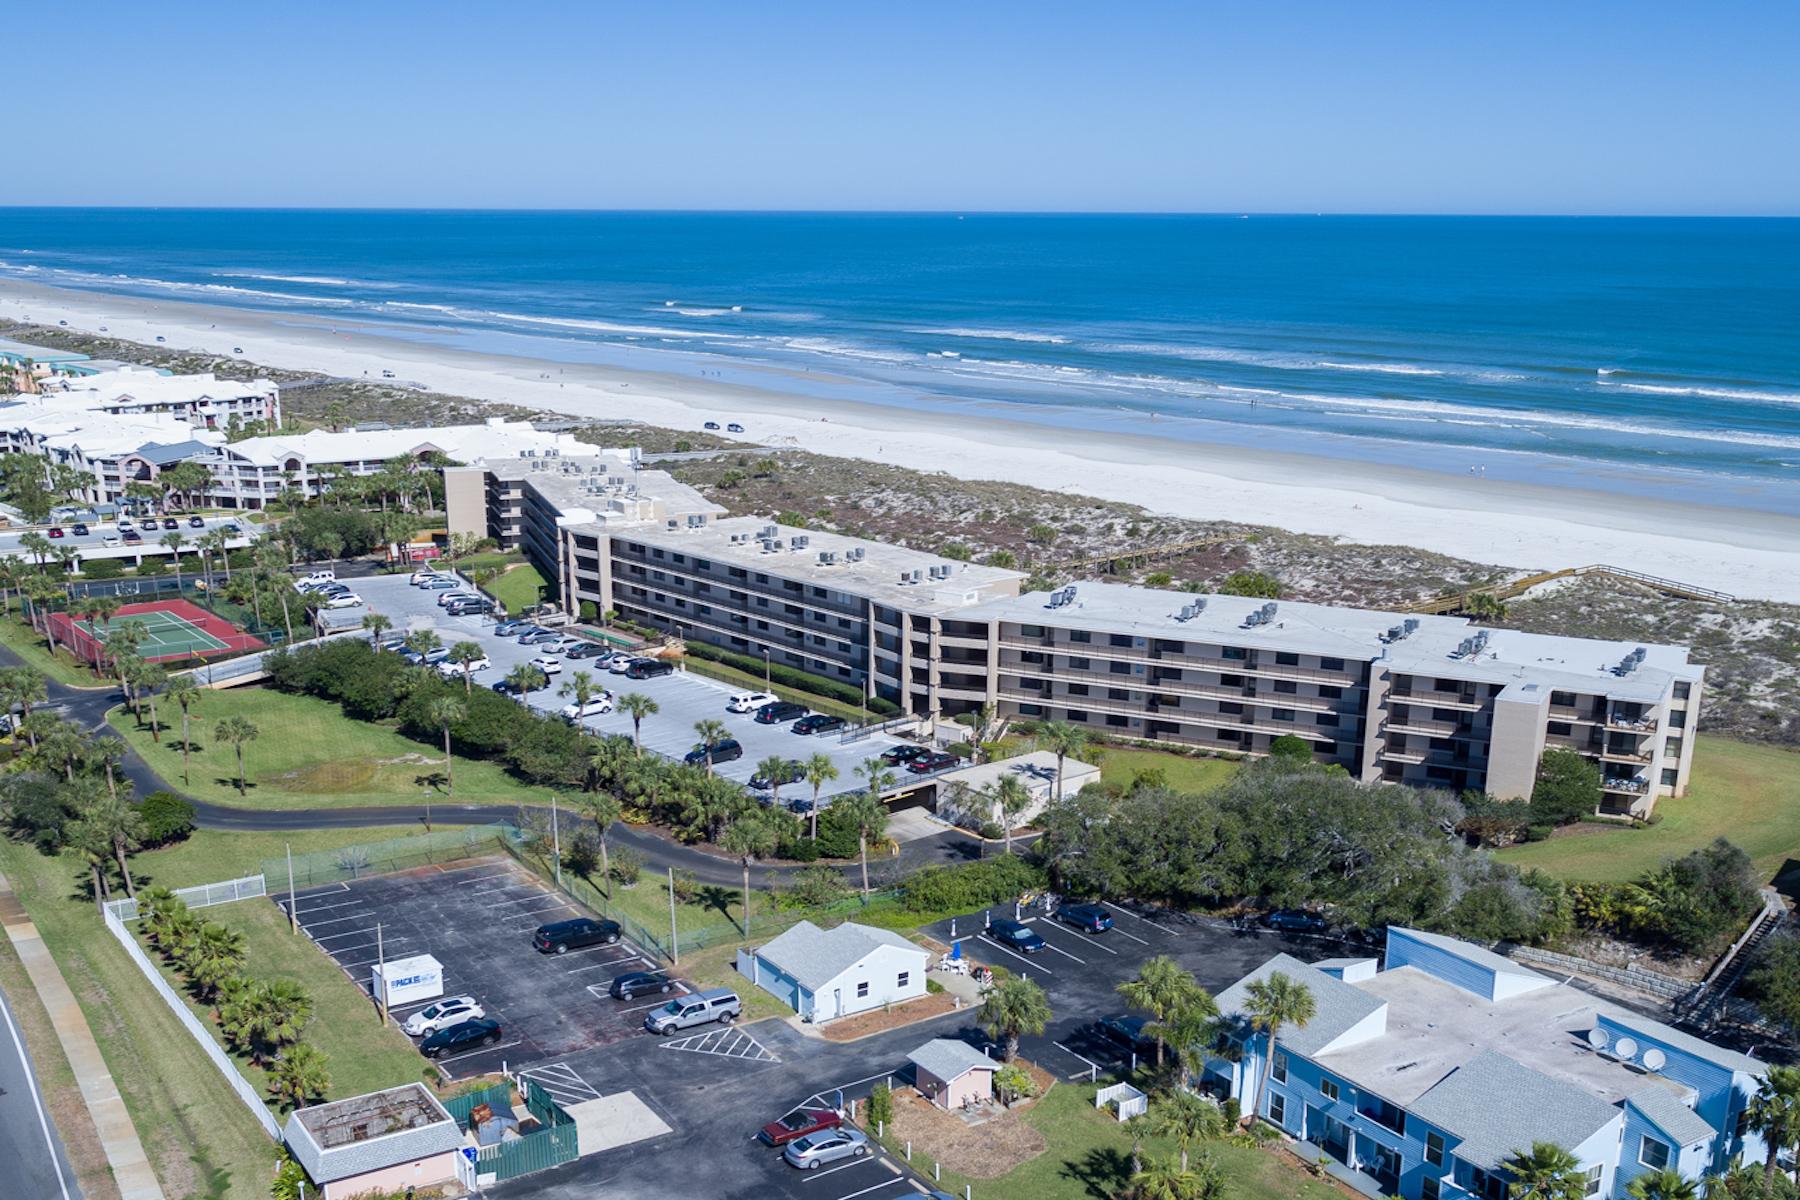 Condominio por un Venta en Barefoot Trace 6240 South A1A #208 St. Augustine, Florida, 32080 Estados Unidos